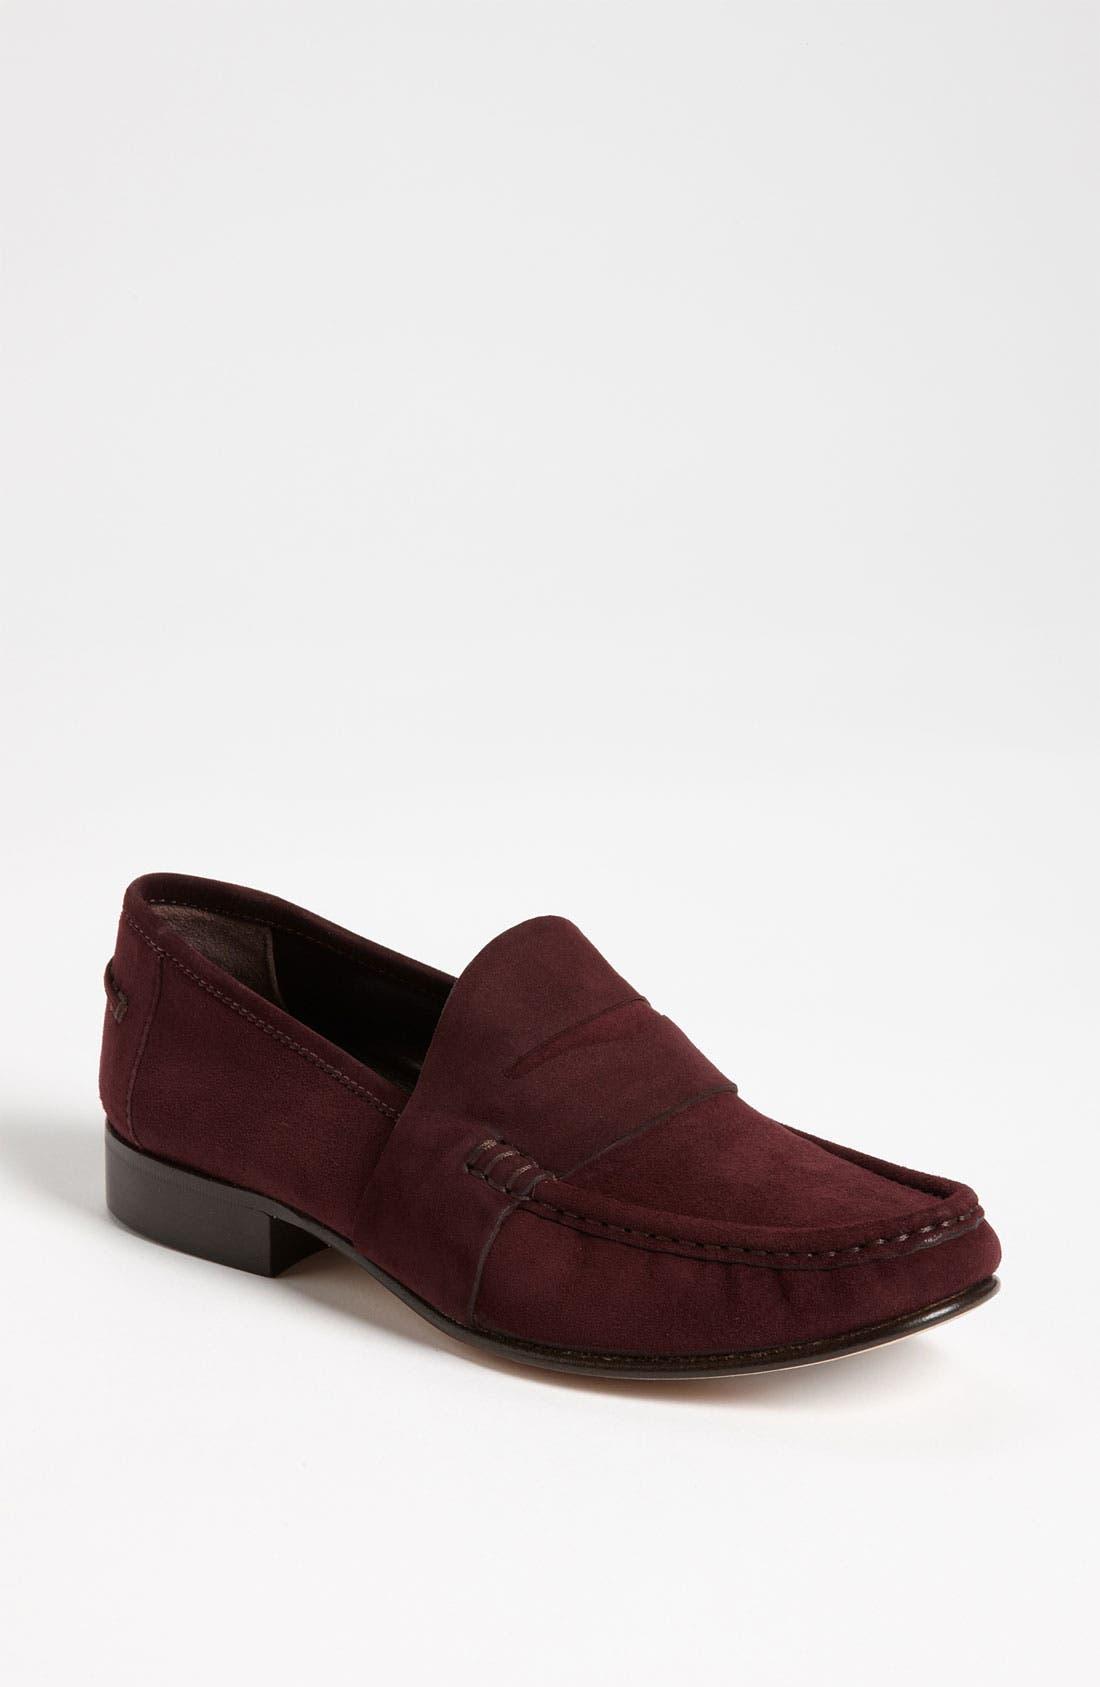 Main Image - Vera Wang Footwear 'Audrey' Loafer